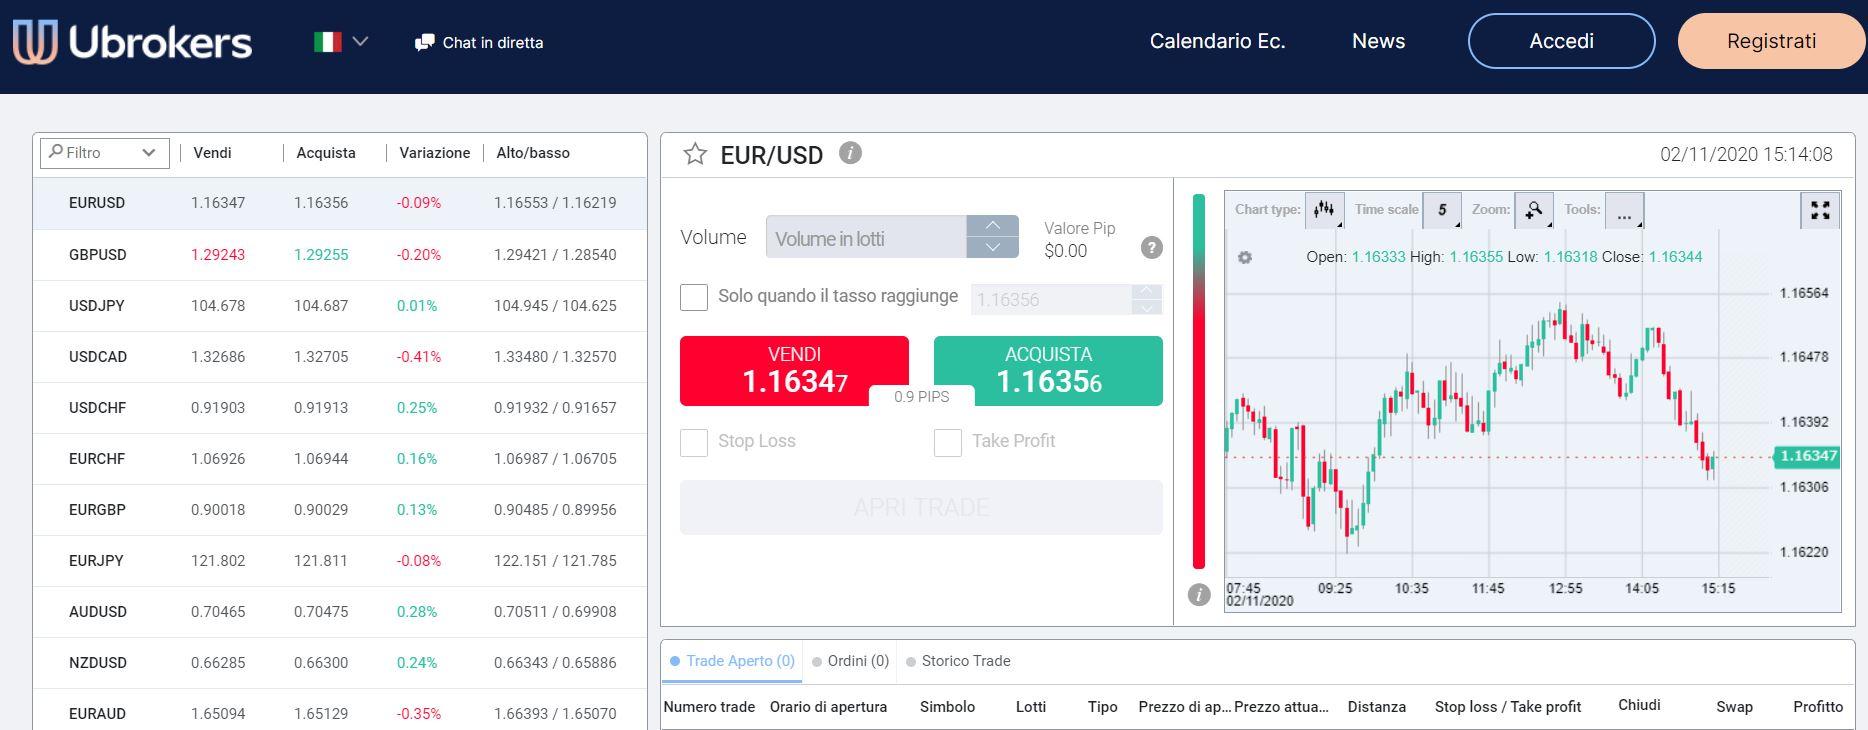 Piattaforme di trading Ubrokers